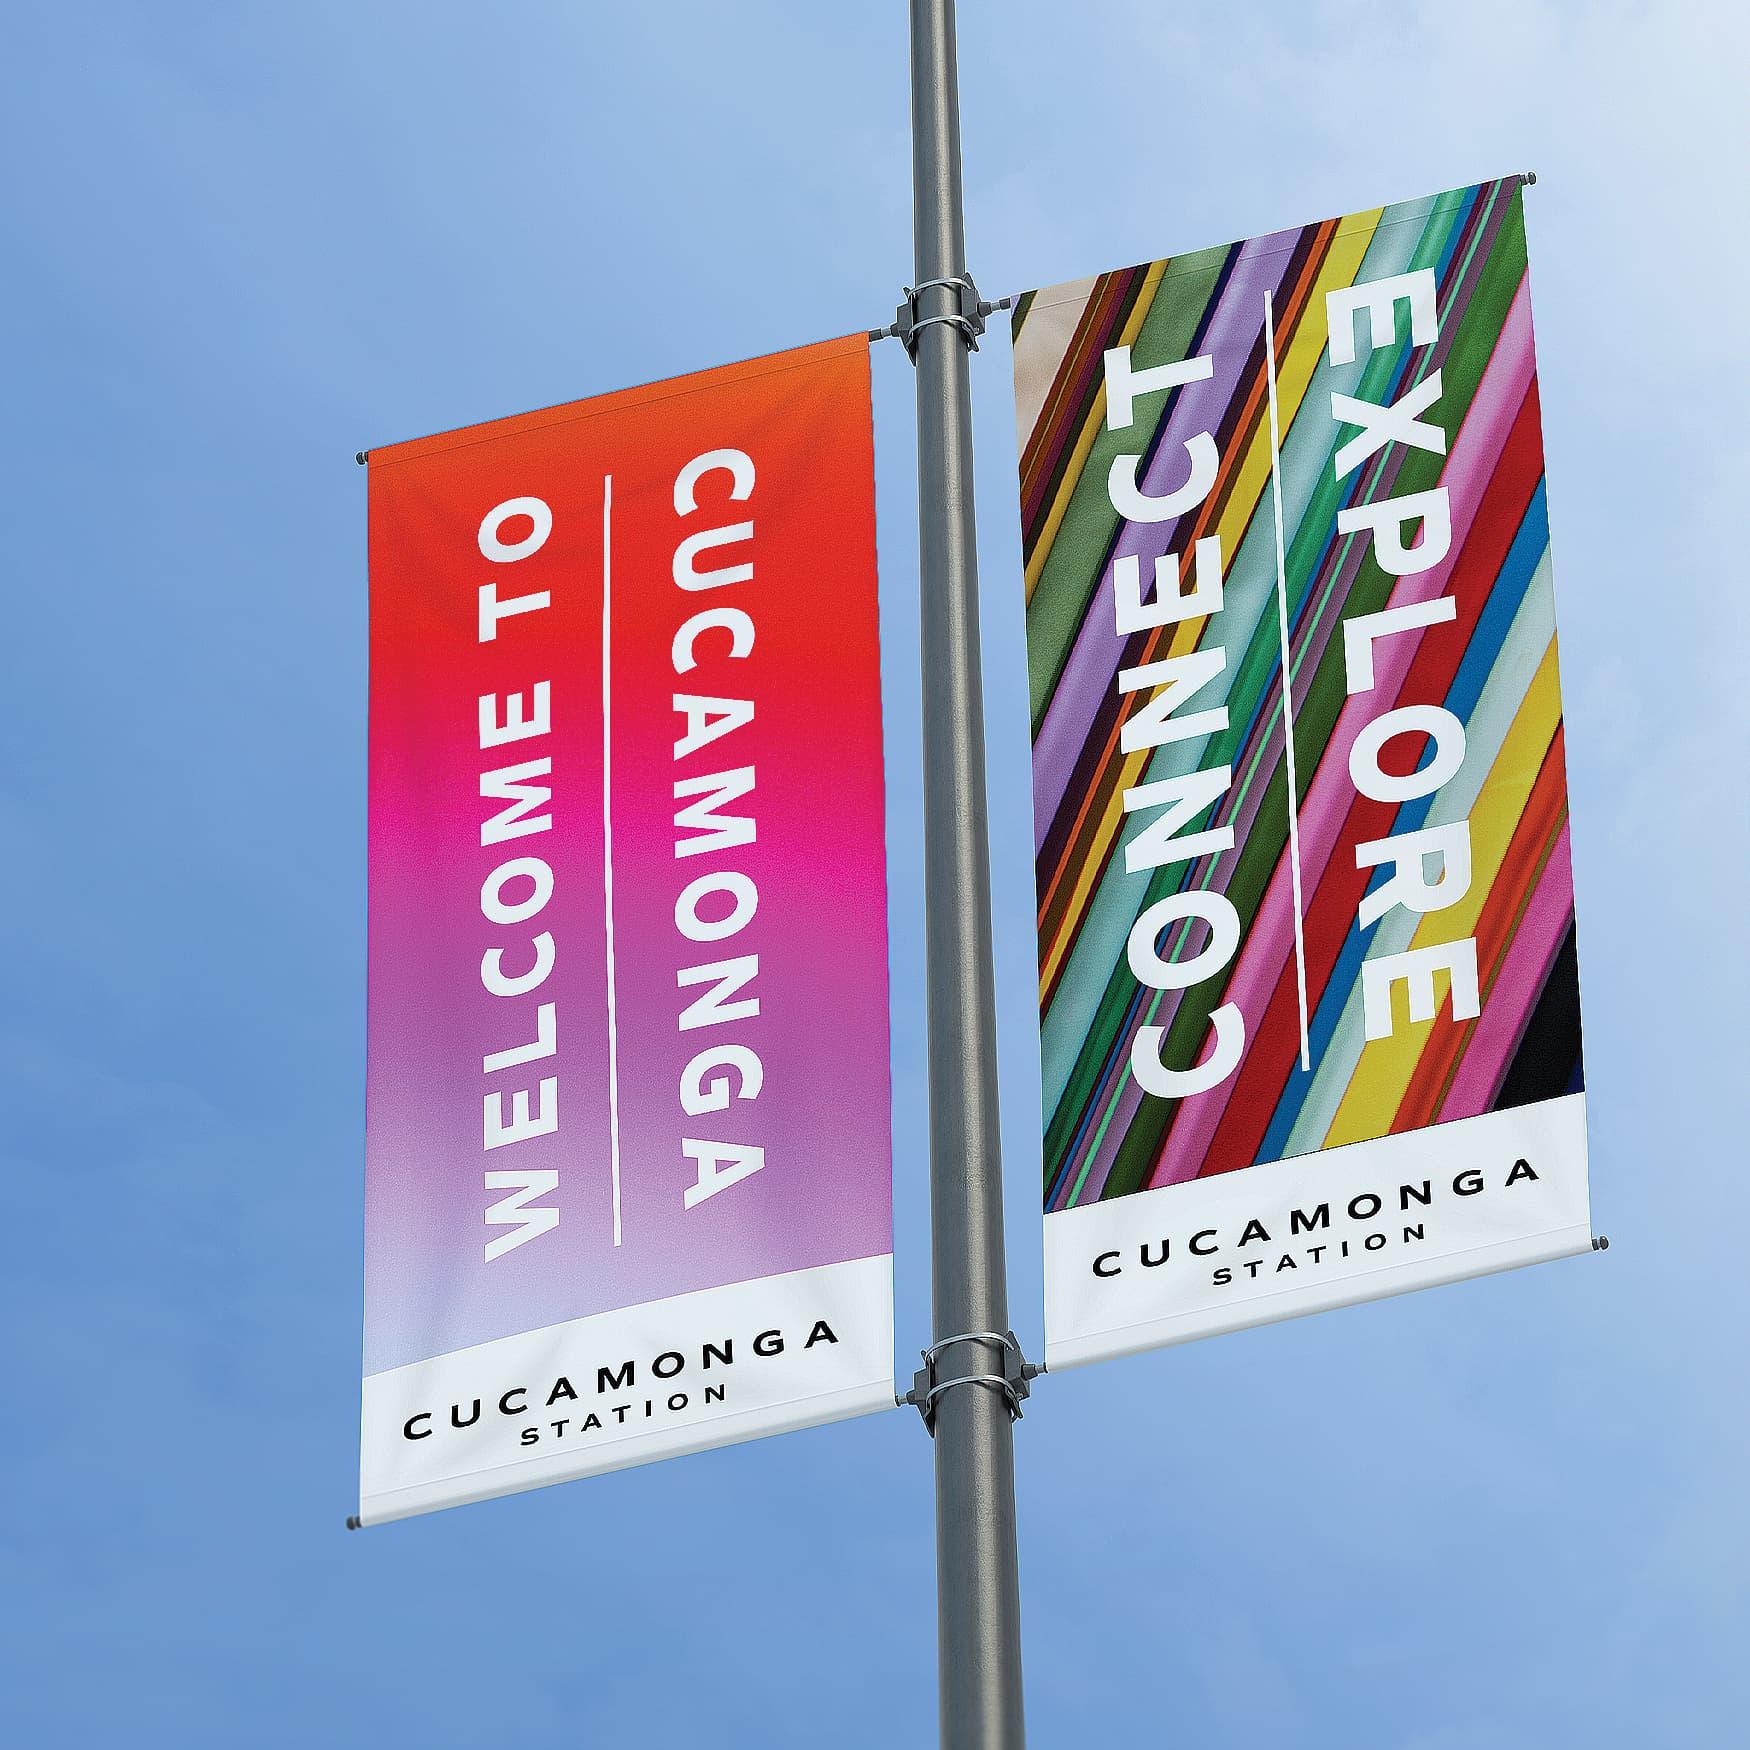 Colorful banners hanging for Cucamonga Station in Rancho Cucamonga, California.